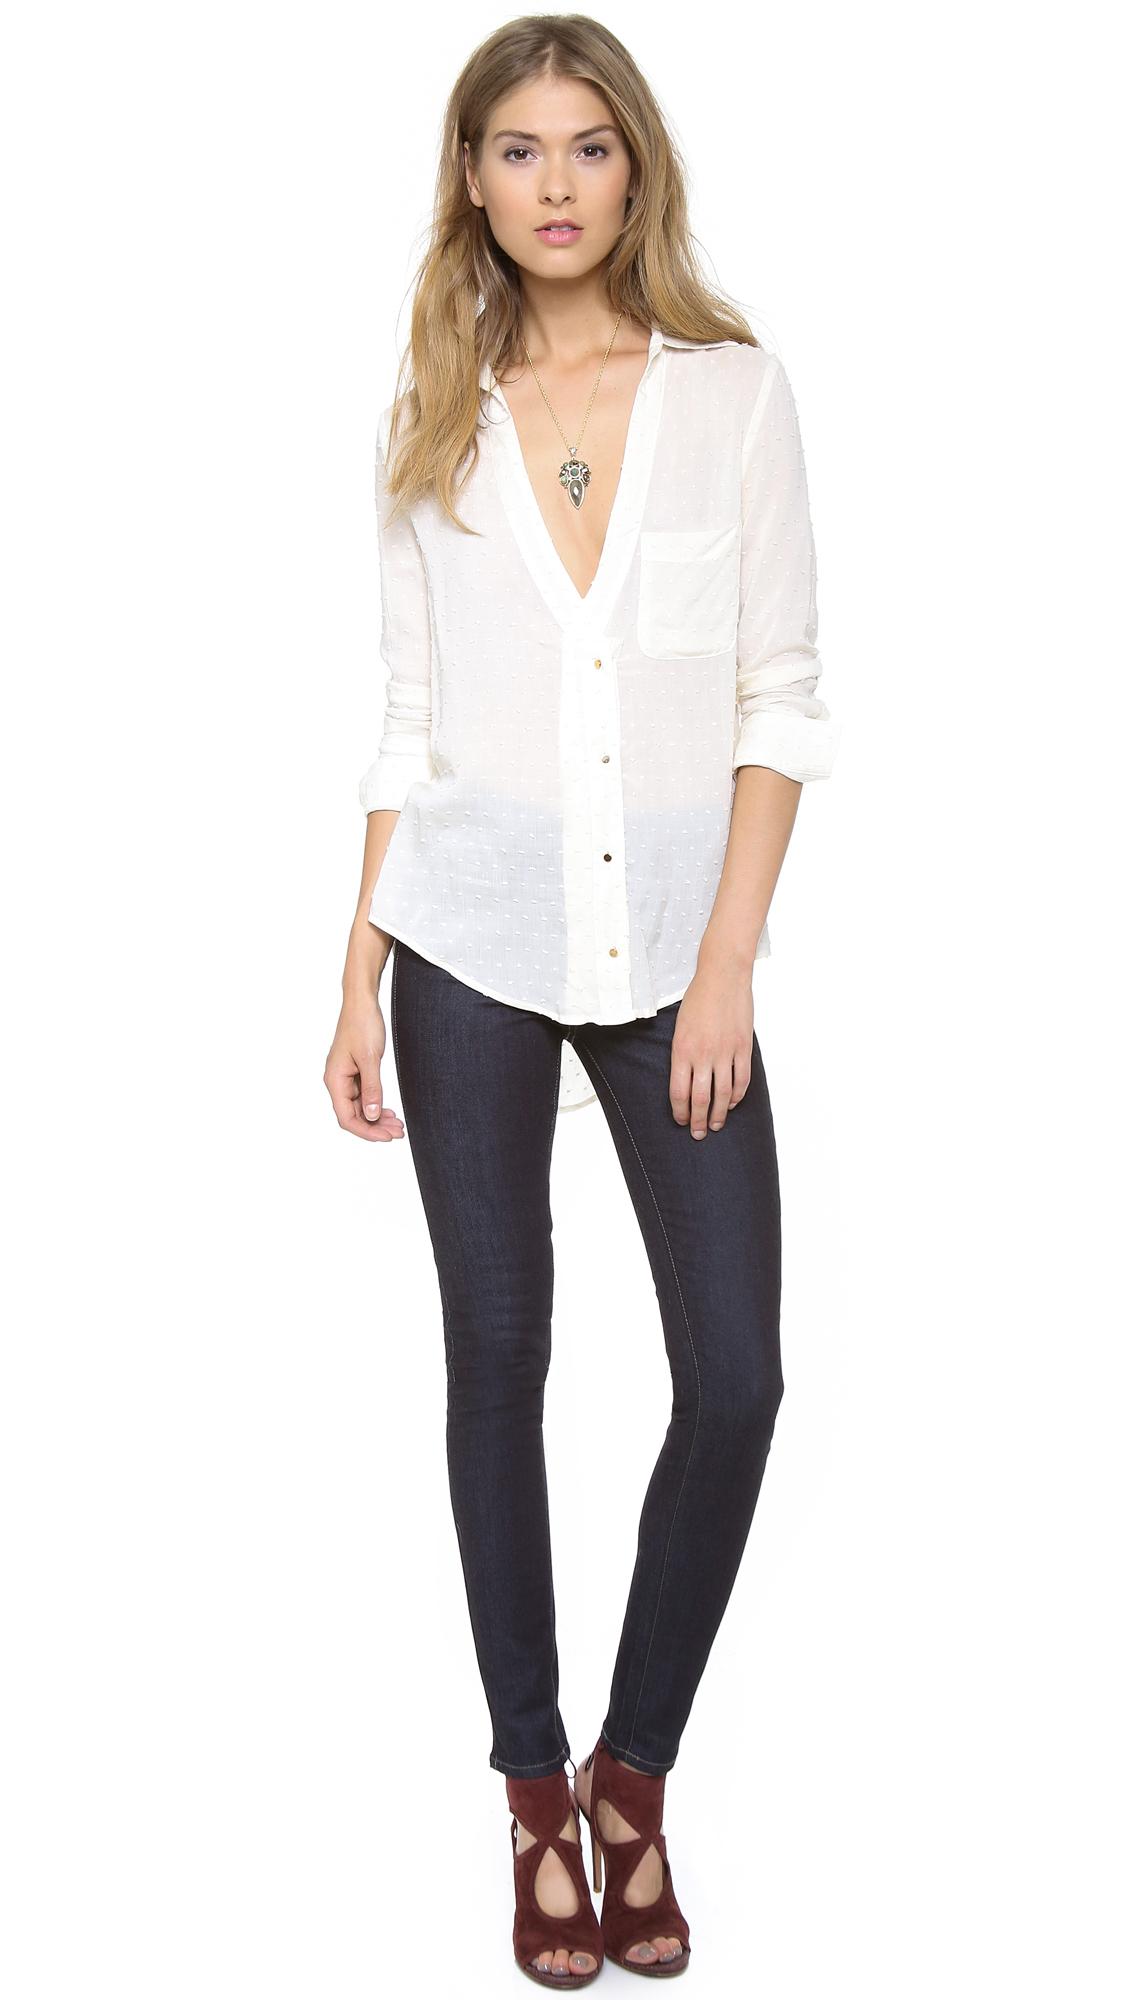 Paige Denim Hoxton Ultra Skinny Jeans - Evolve In Blue